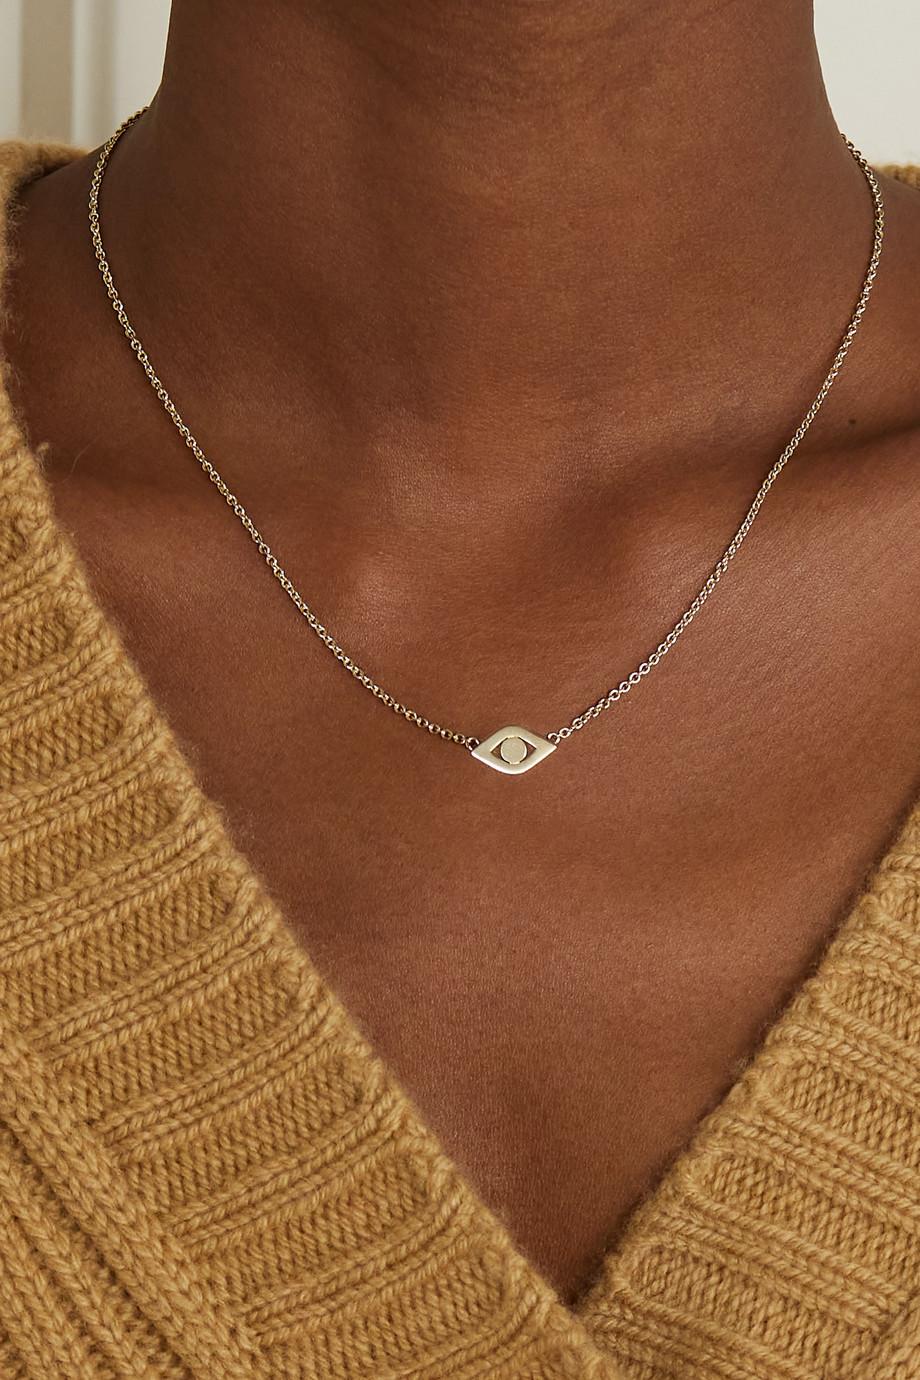 Sydney Evan Large Evil Eye 14-karat gold necklace